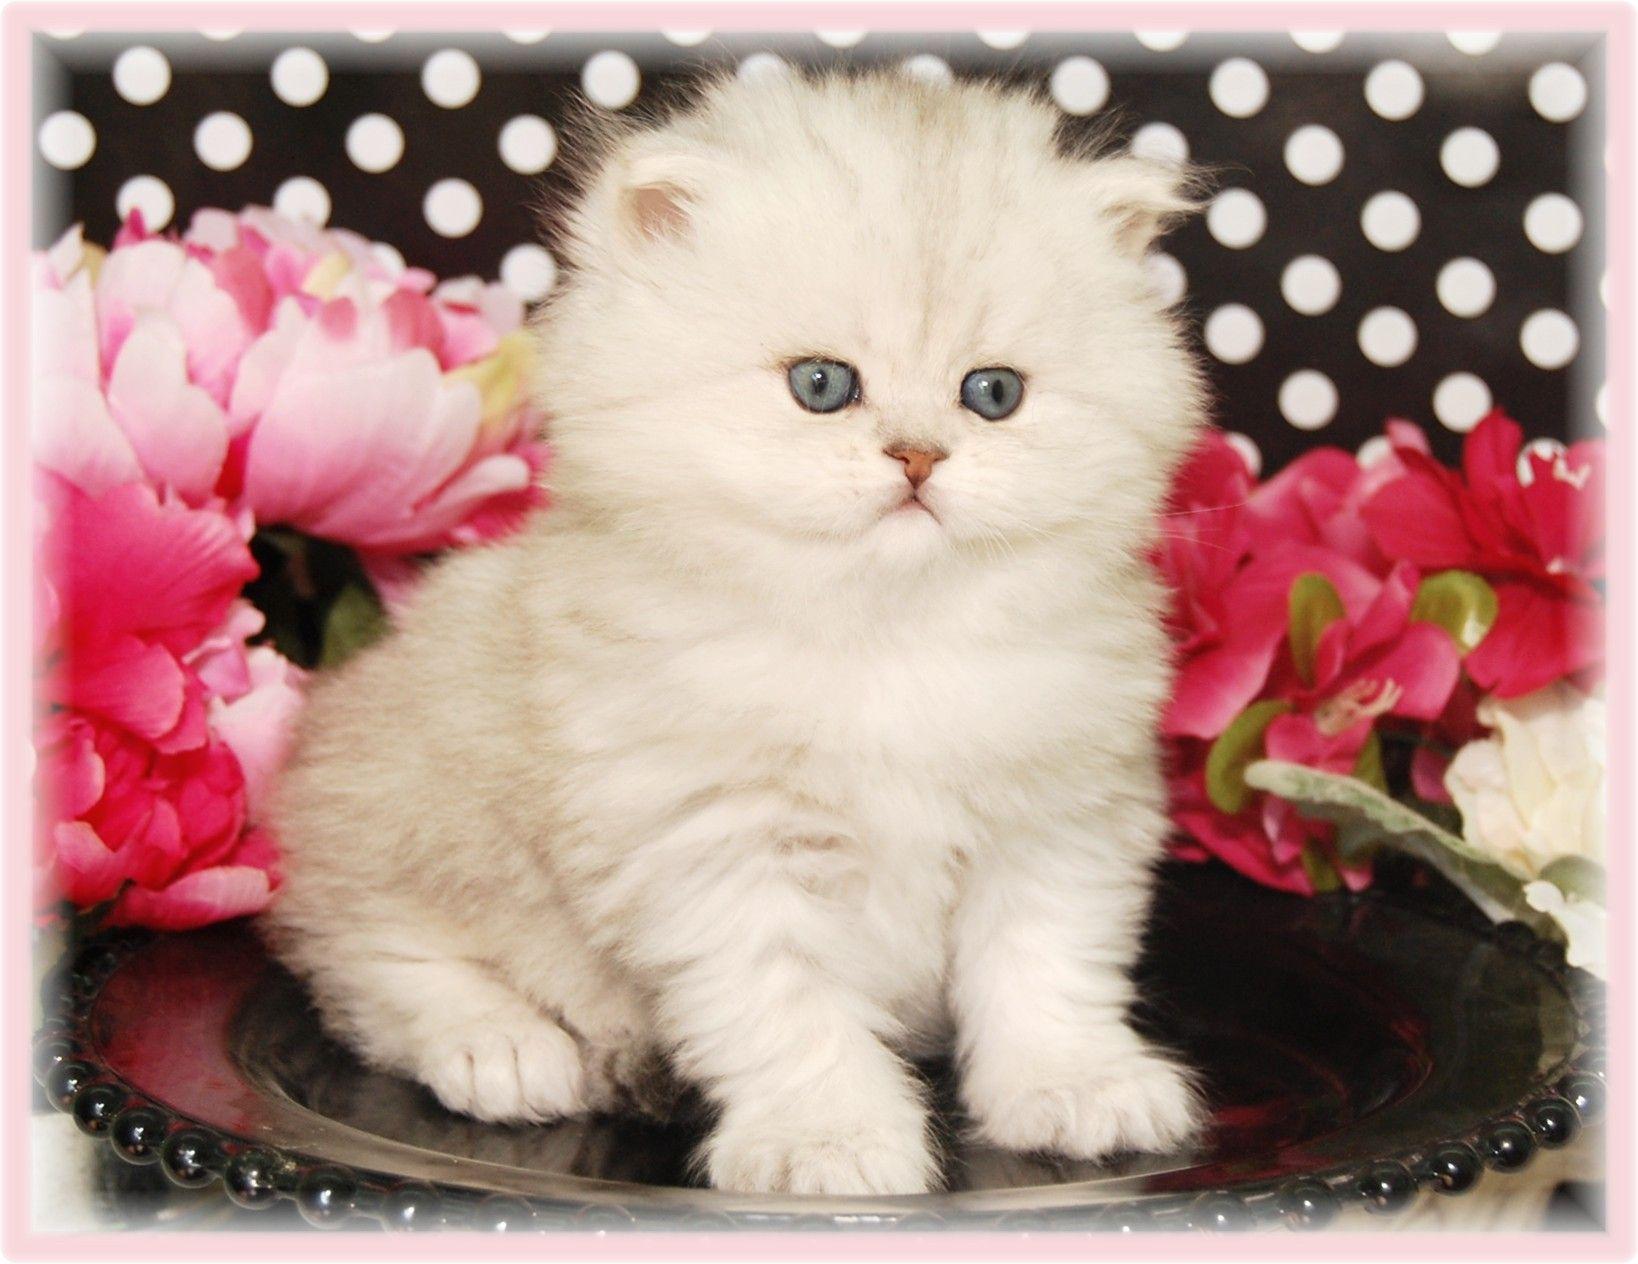 Silver Dolls Cattery Teacup Kittens for sale Kittens